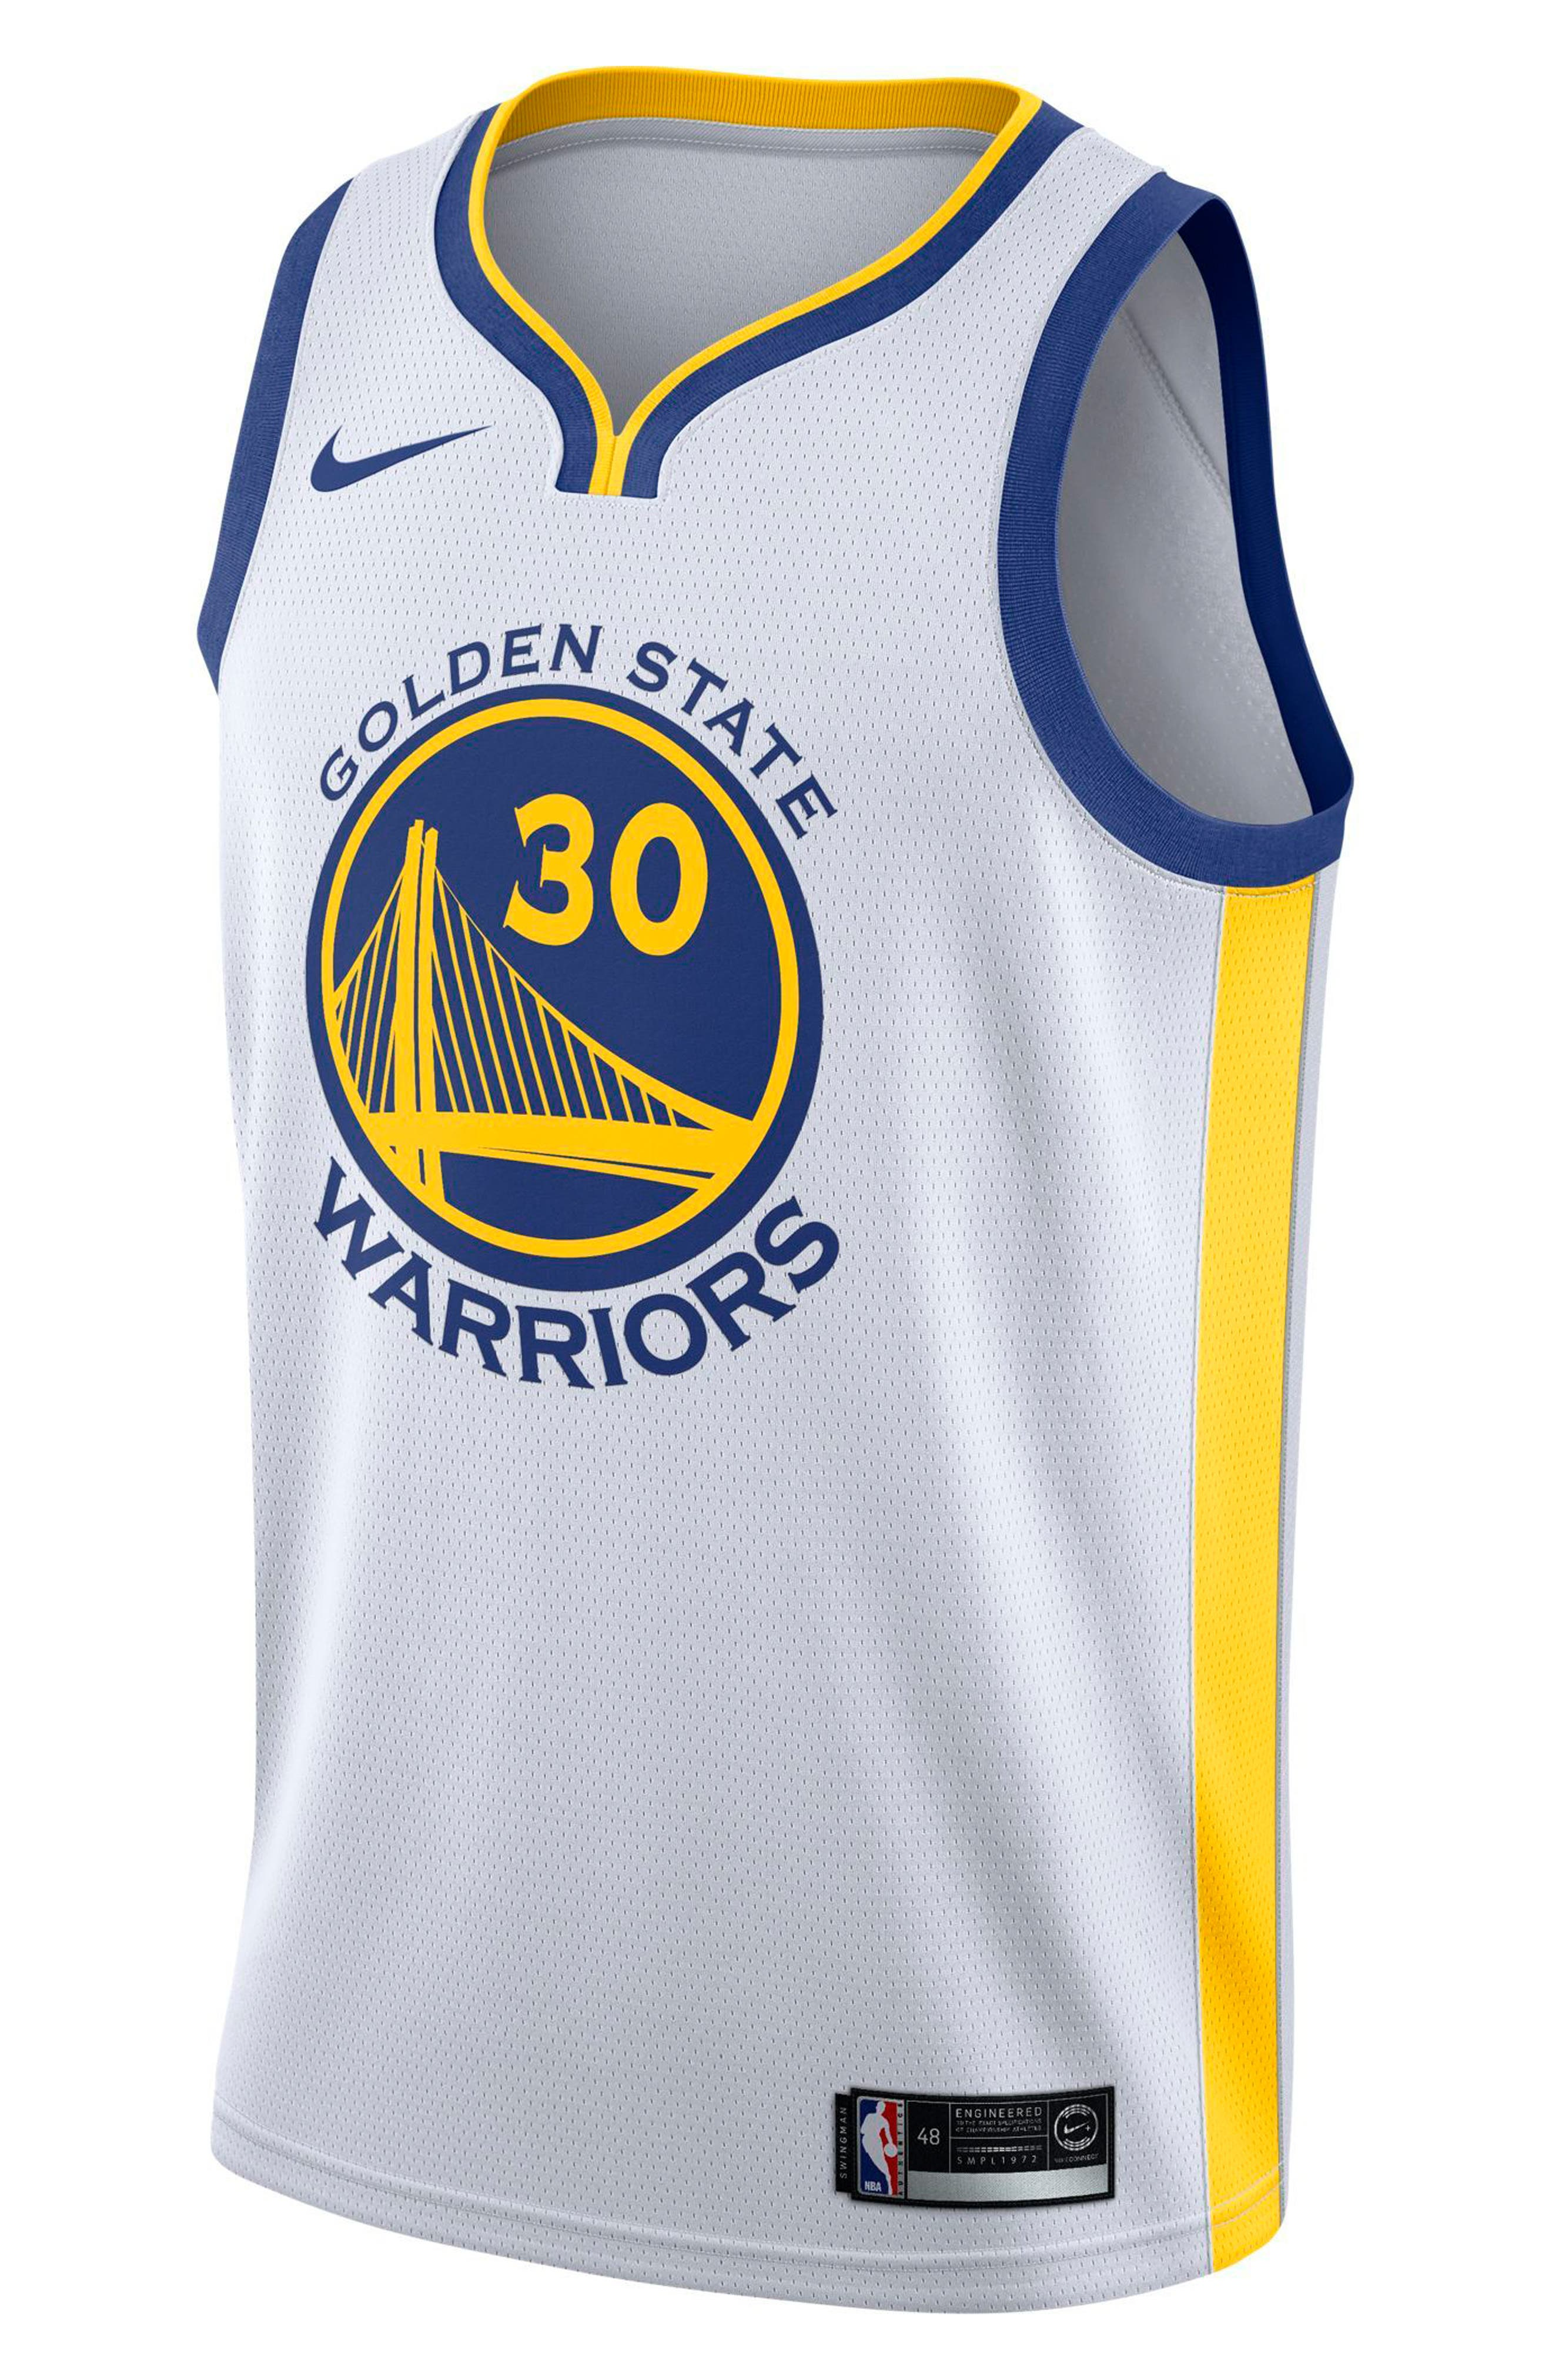 Alternate Image 1 Selected - Nike Golden State Warriors Nike Association Edition Swingman Men's NBA Jersey